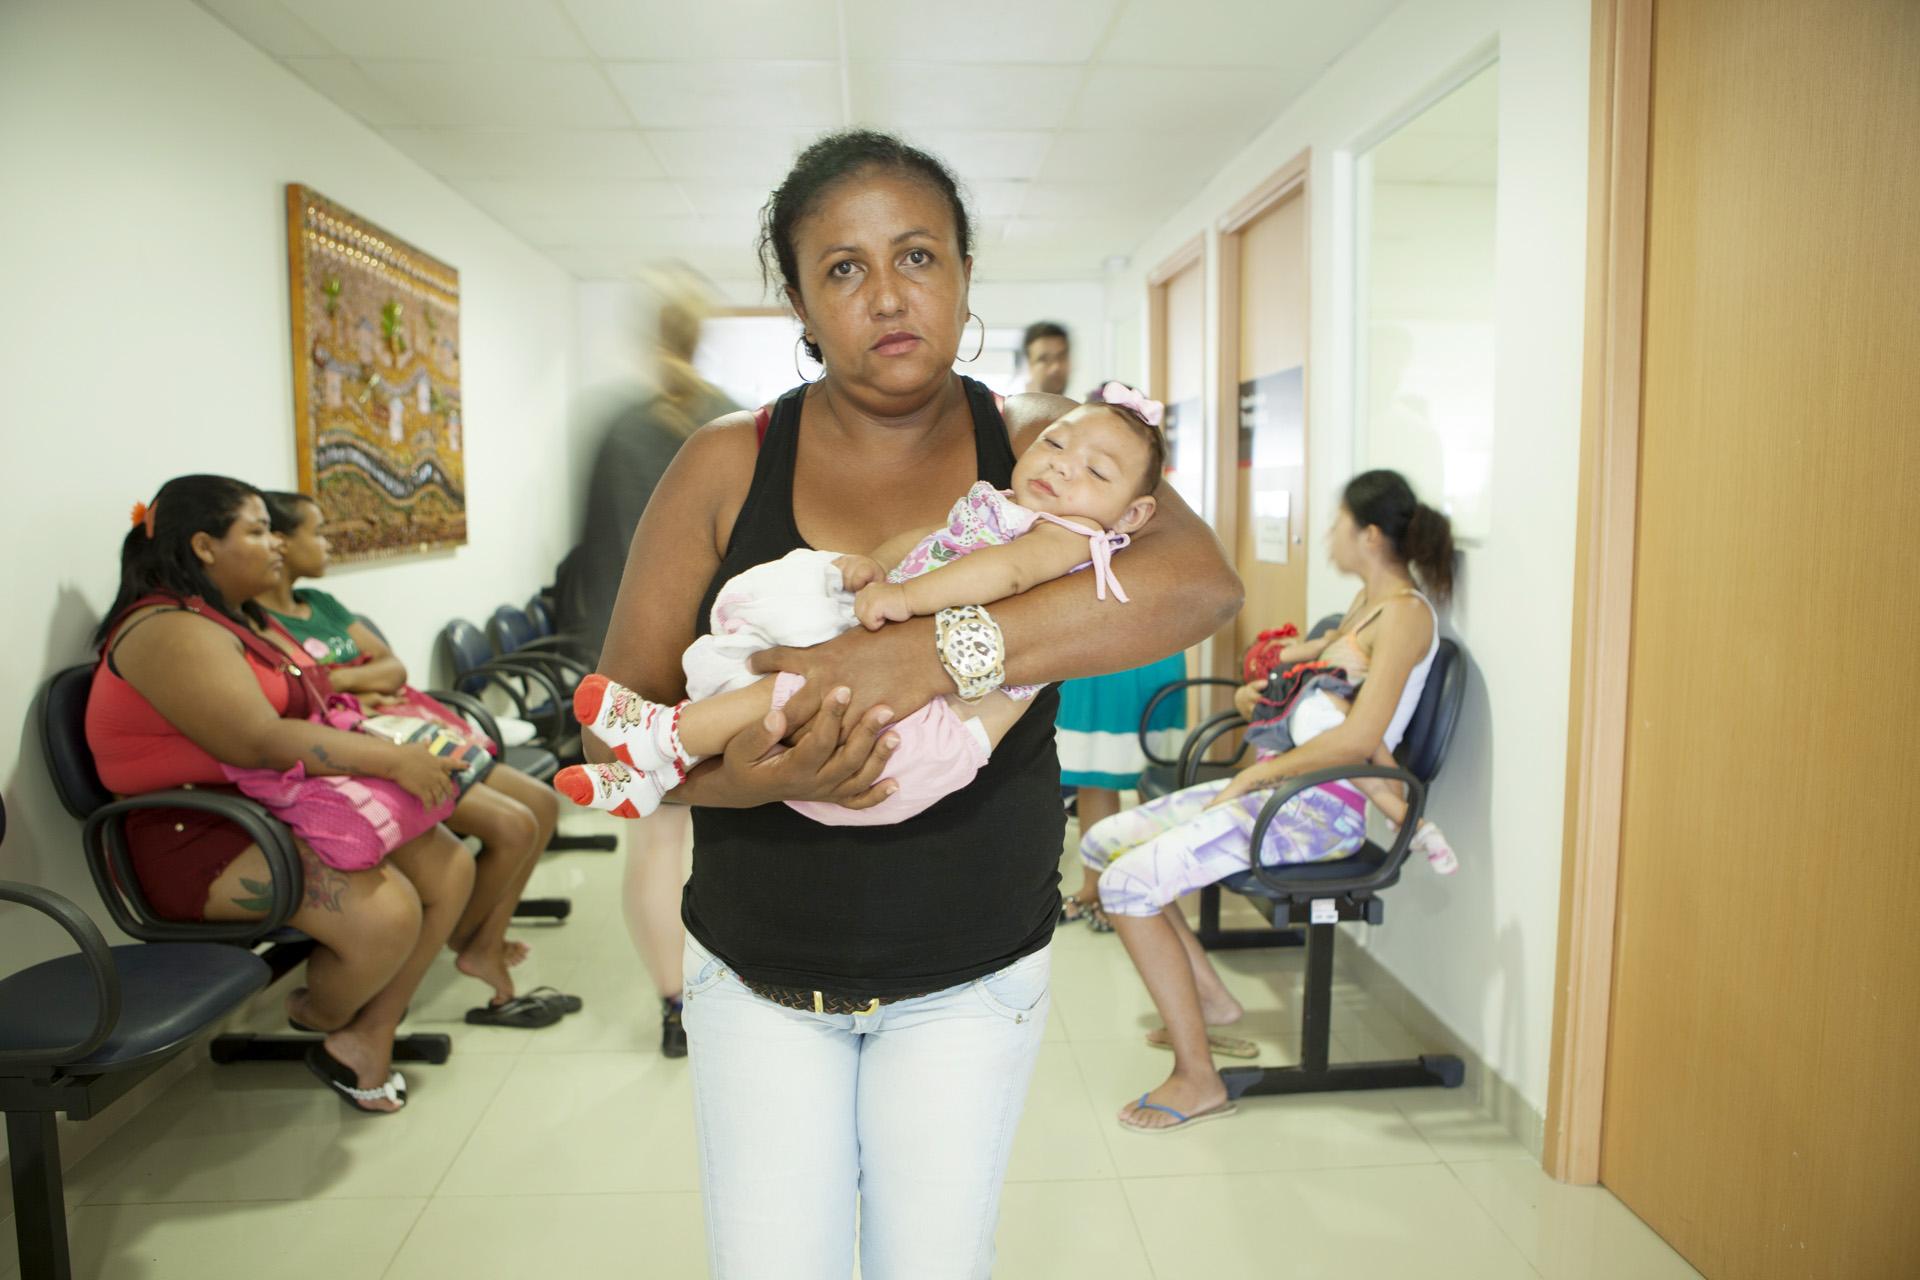 Nadja Cristina Gomes Bezerra